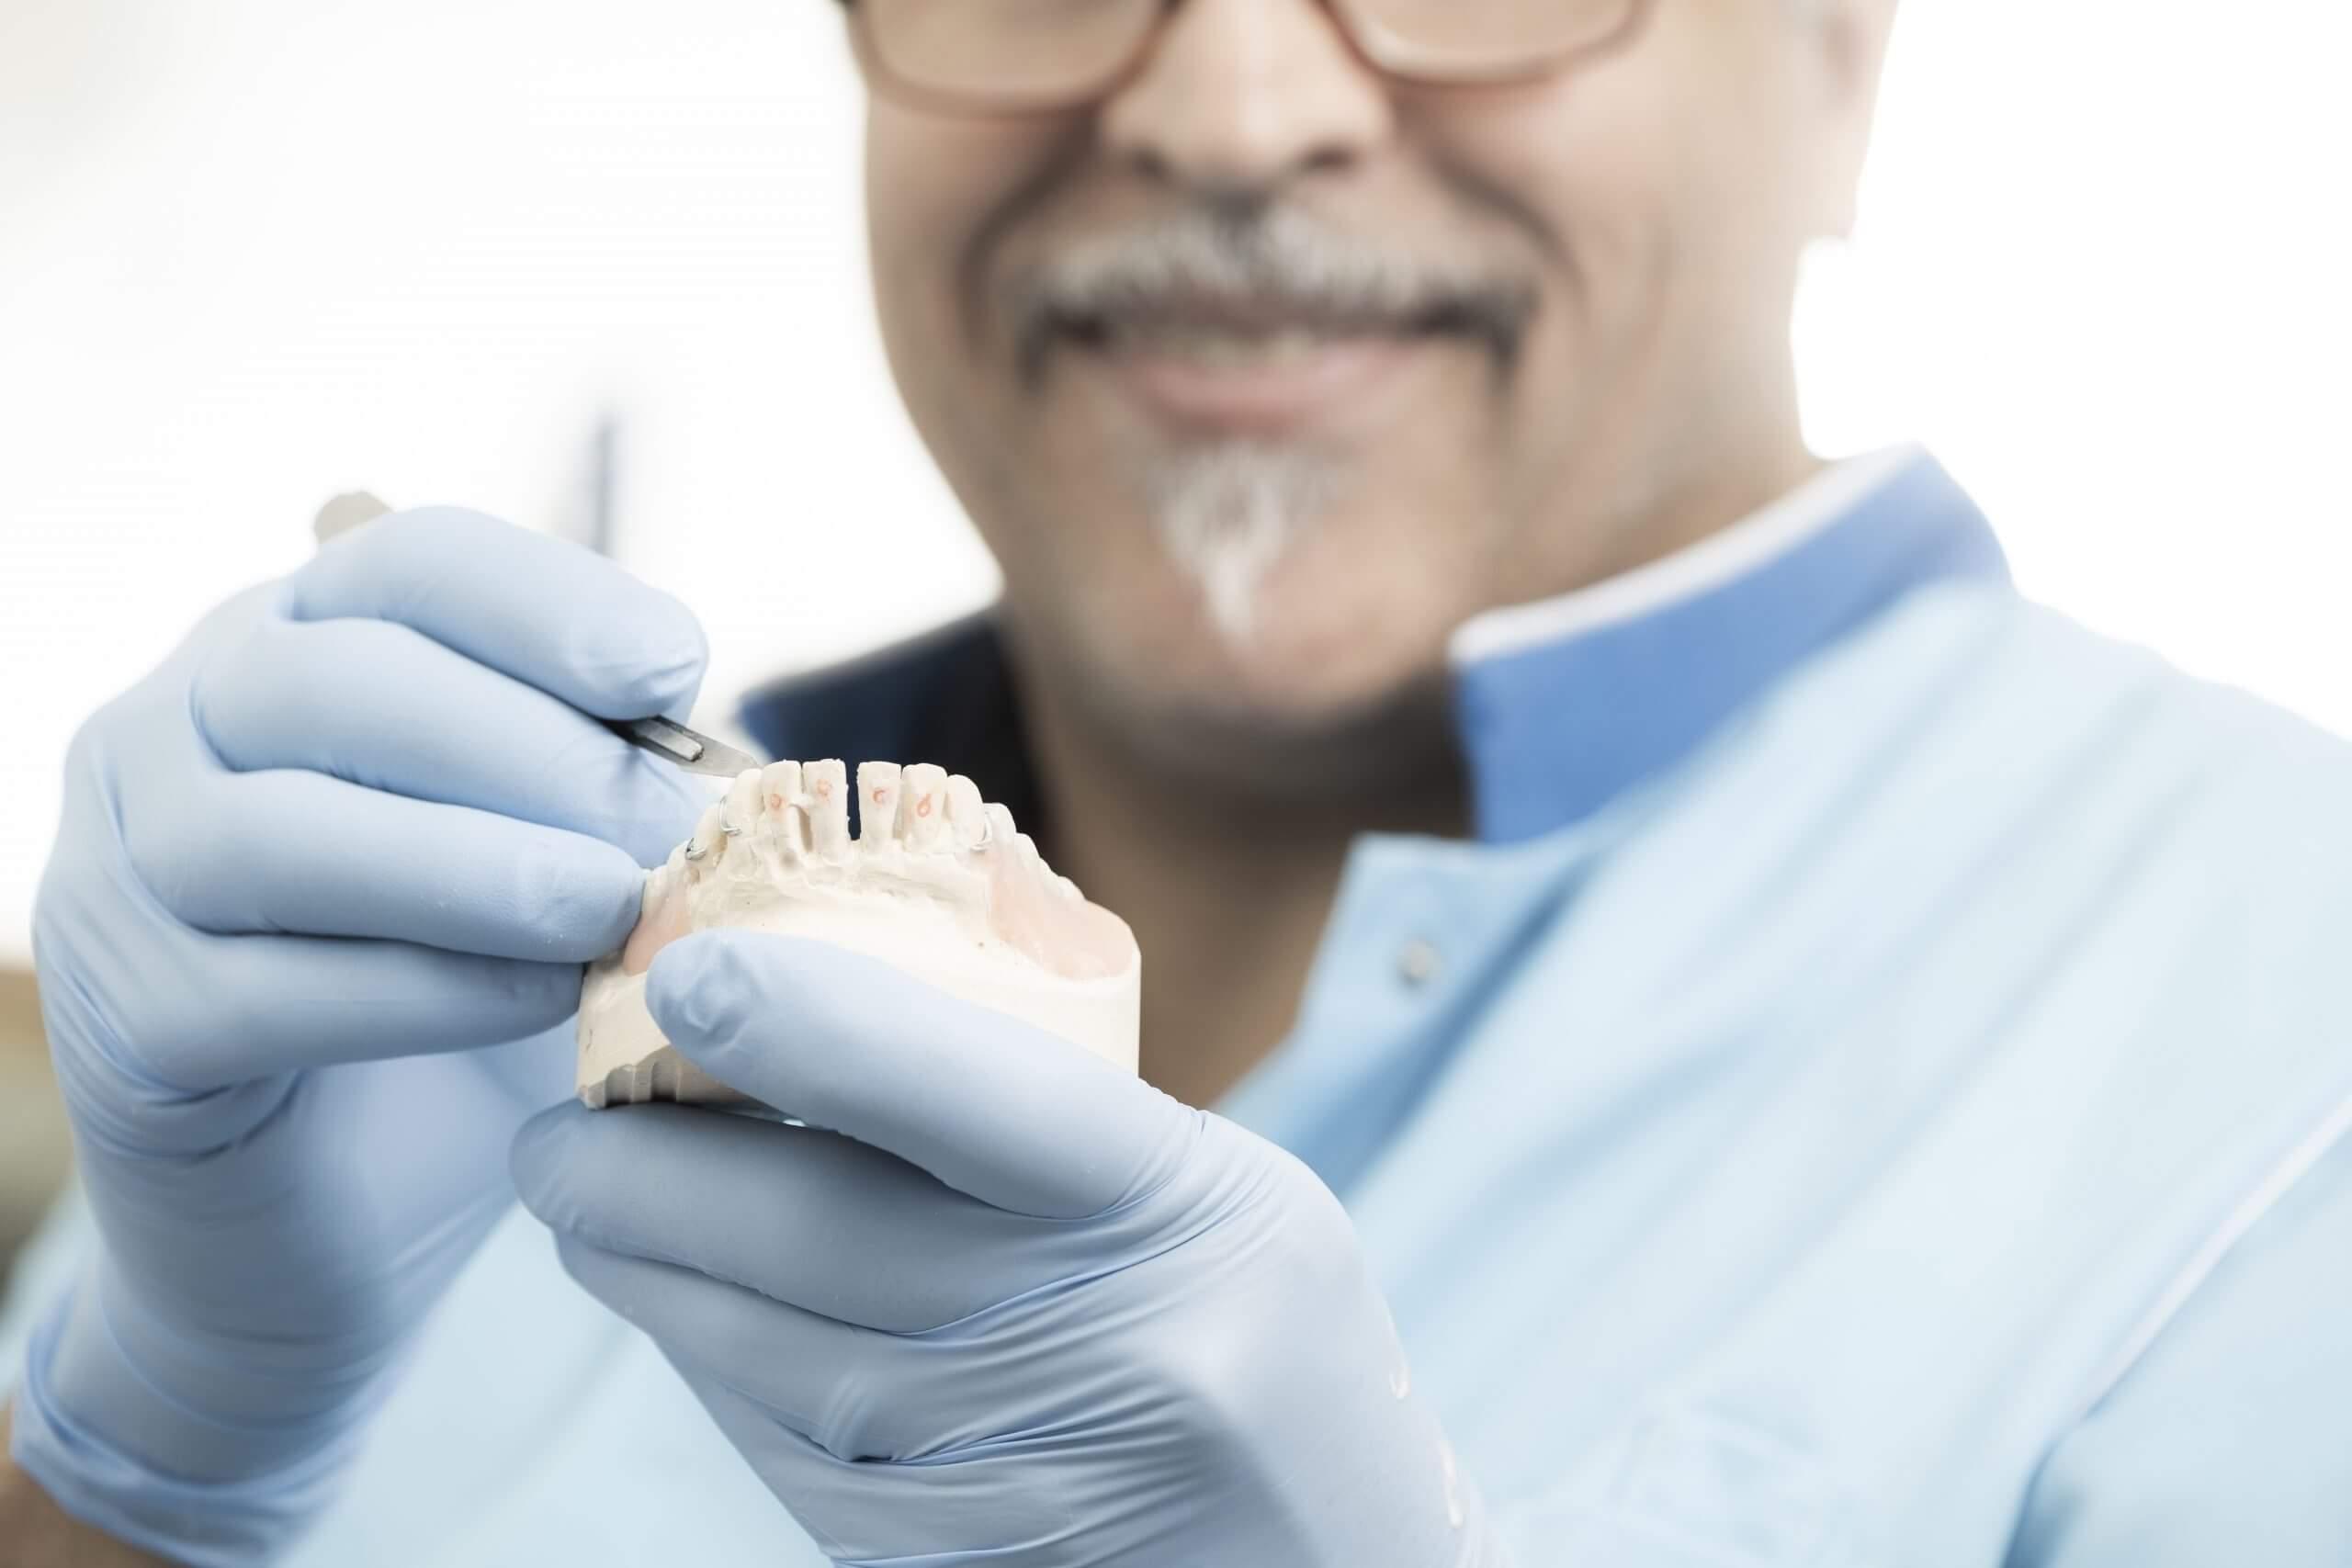 webton ouder amstel tandarts bedrijfs reportage